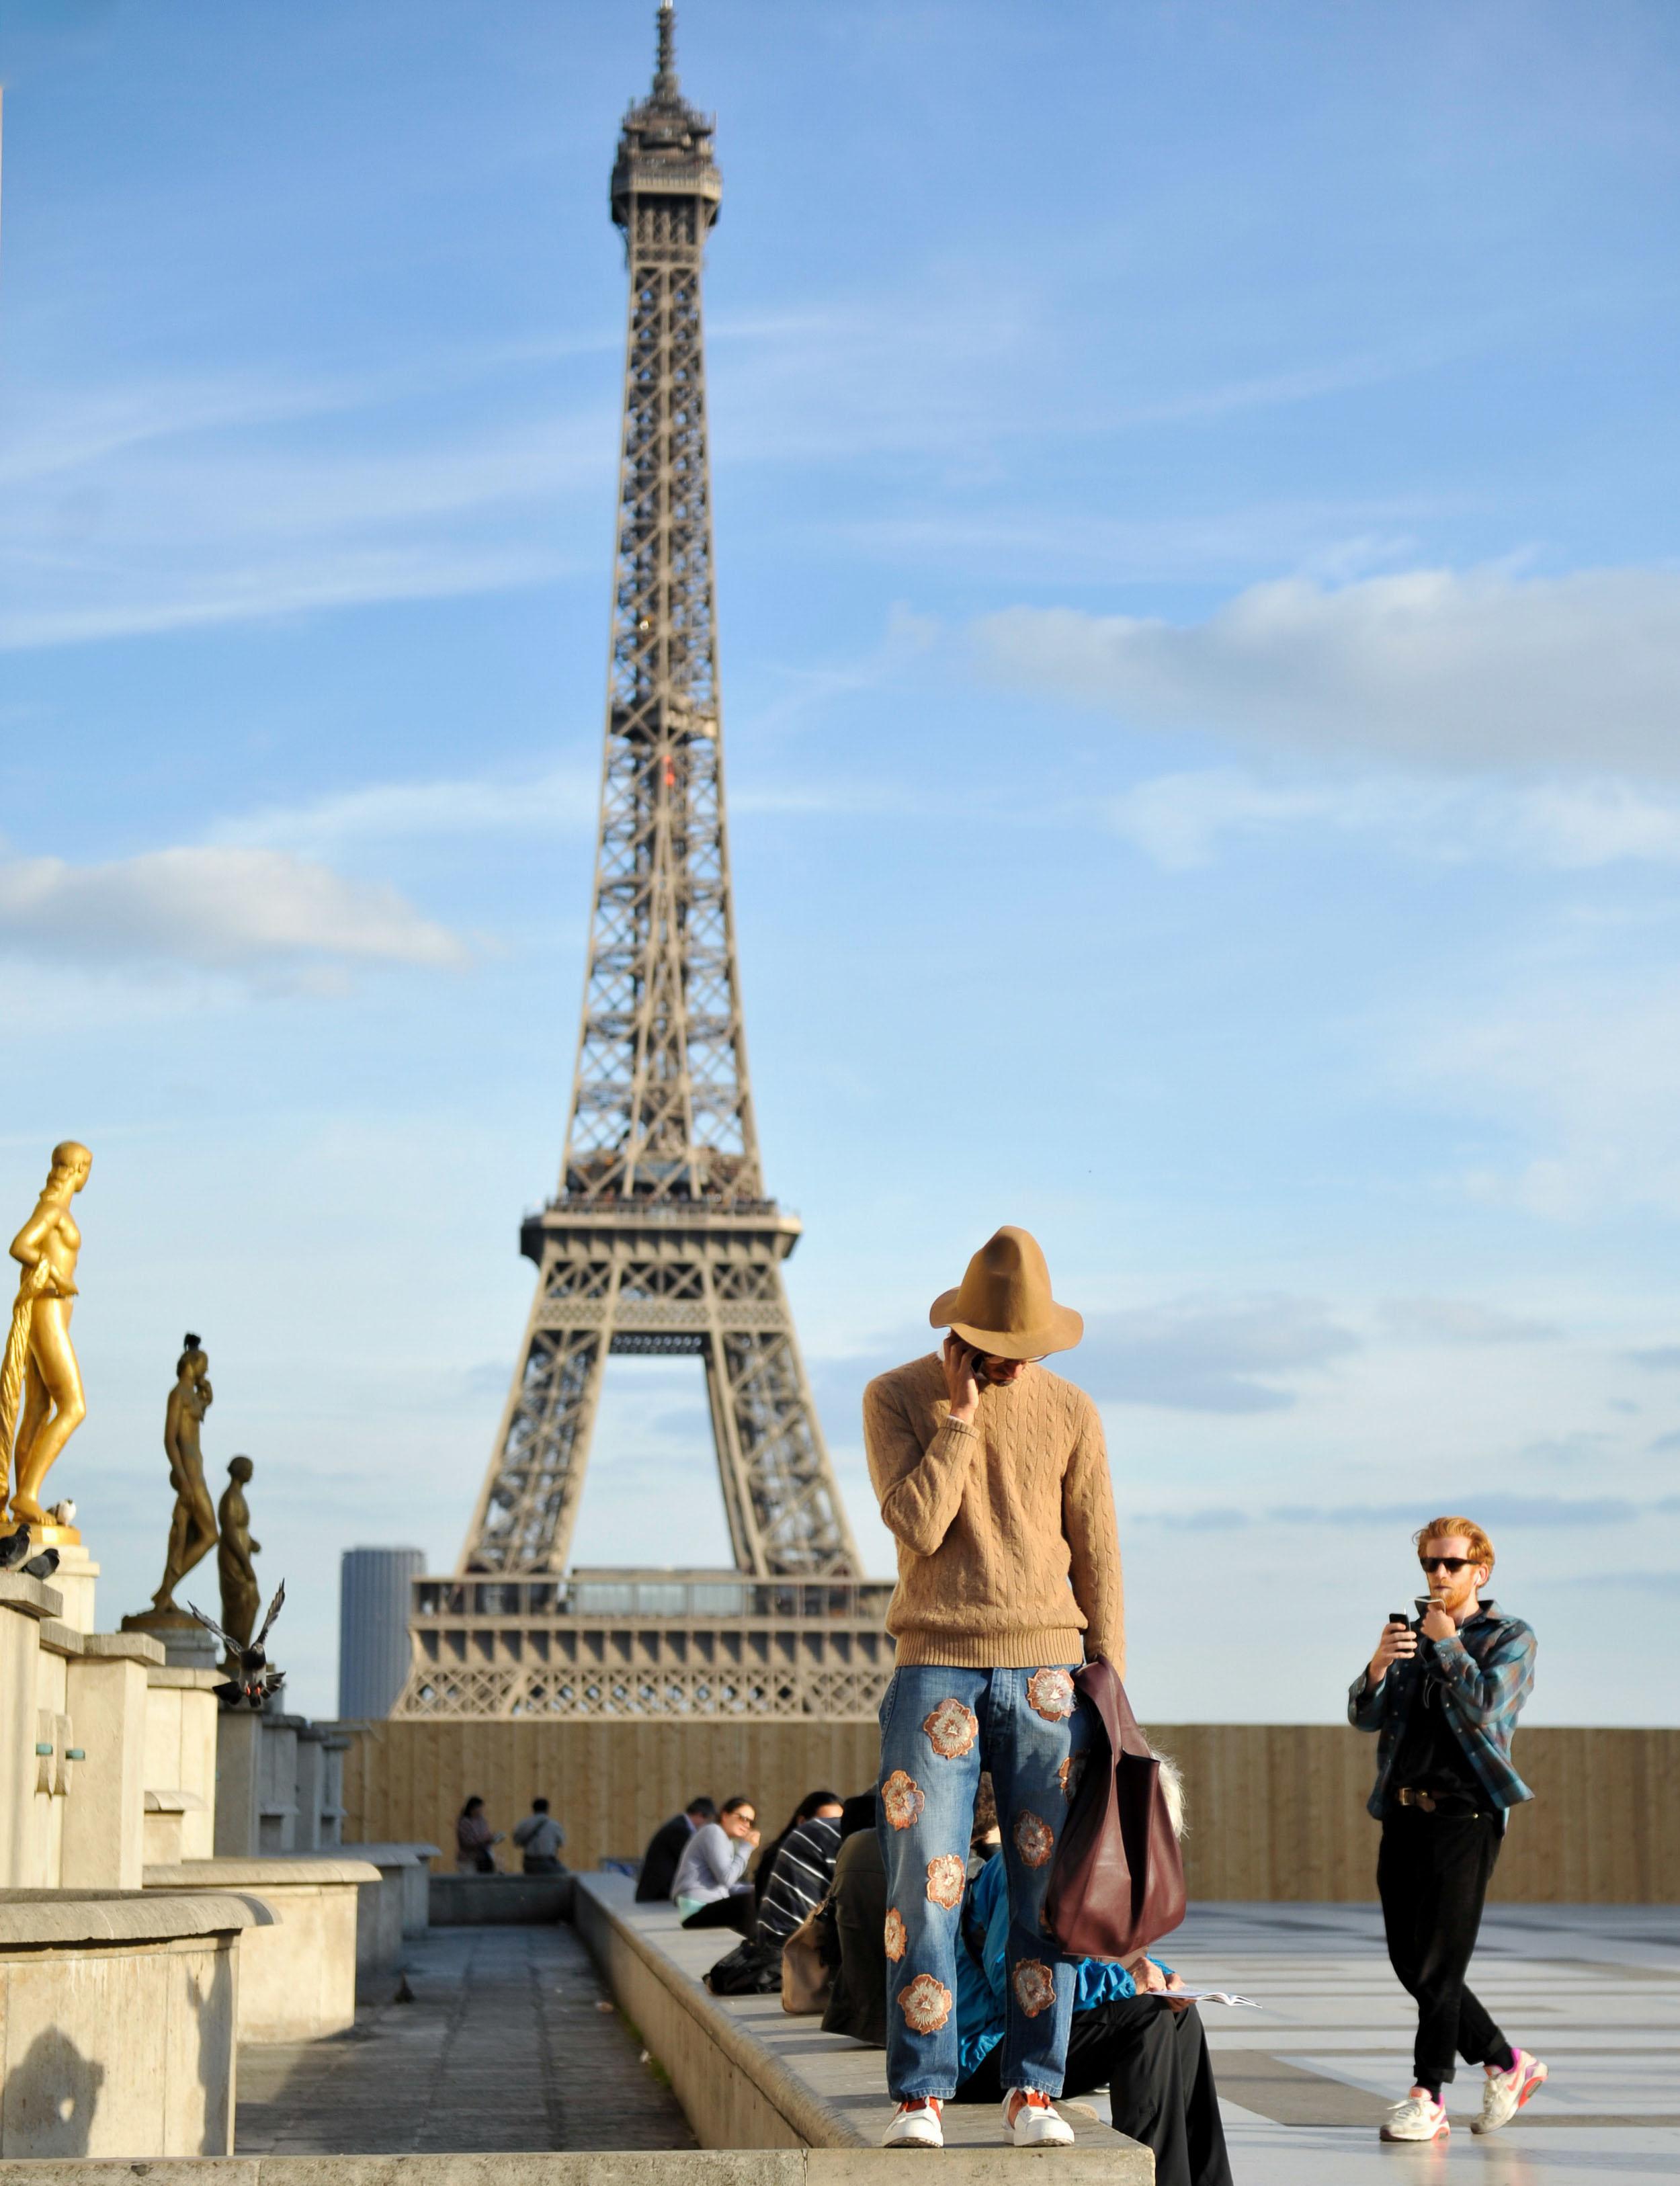 StreetStyle_ParisFashionWeek_LeandroJusten_079.jpg